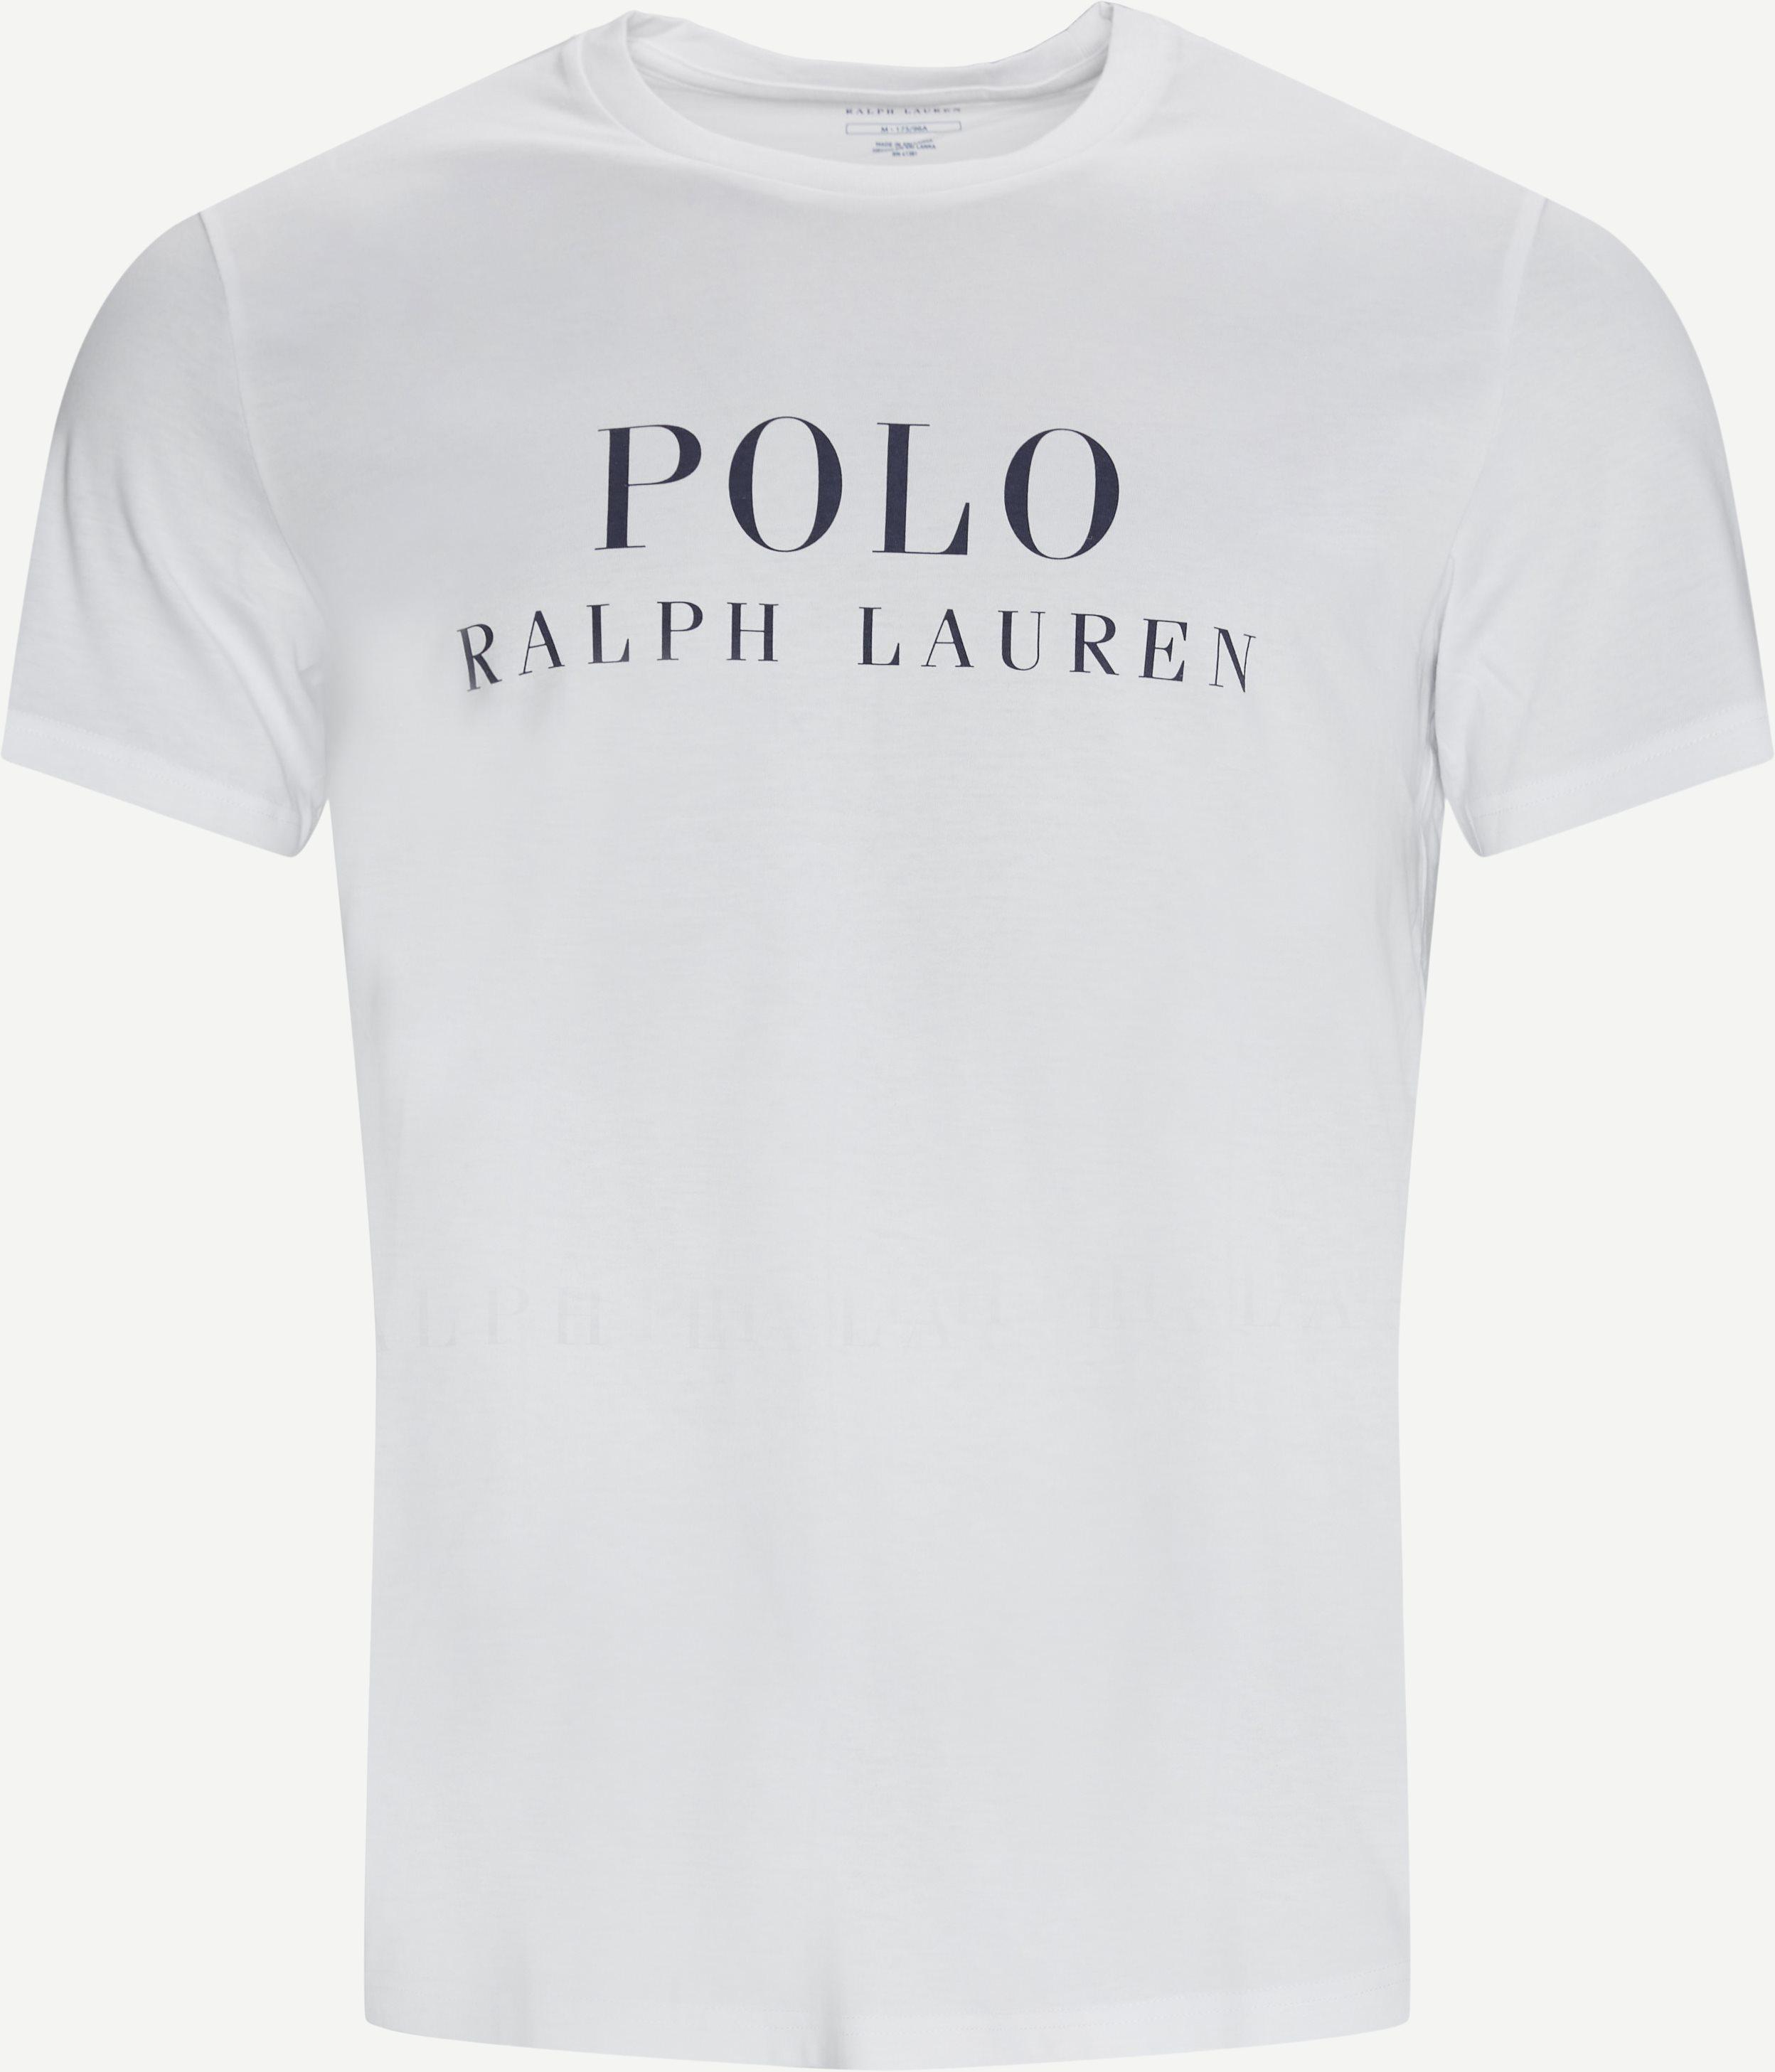 Printet Crew Neck T-shirt - T-shirts - Regular fit - Hvid